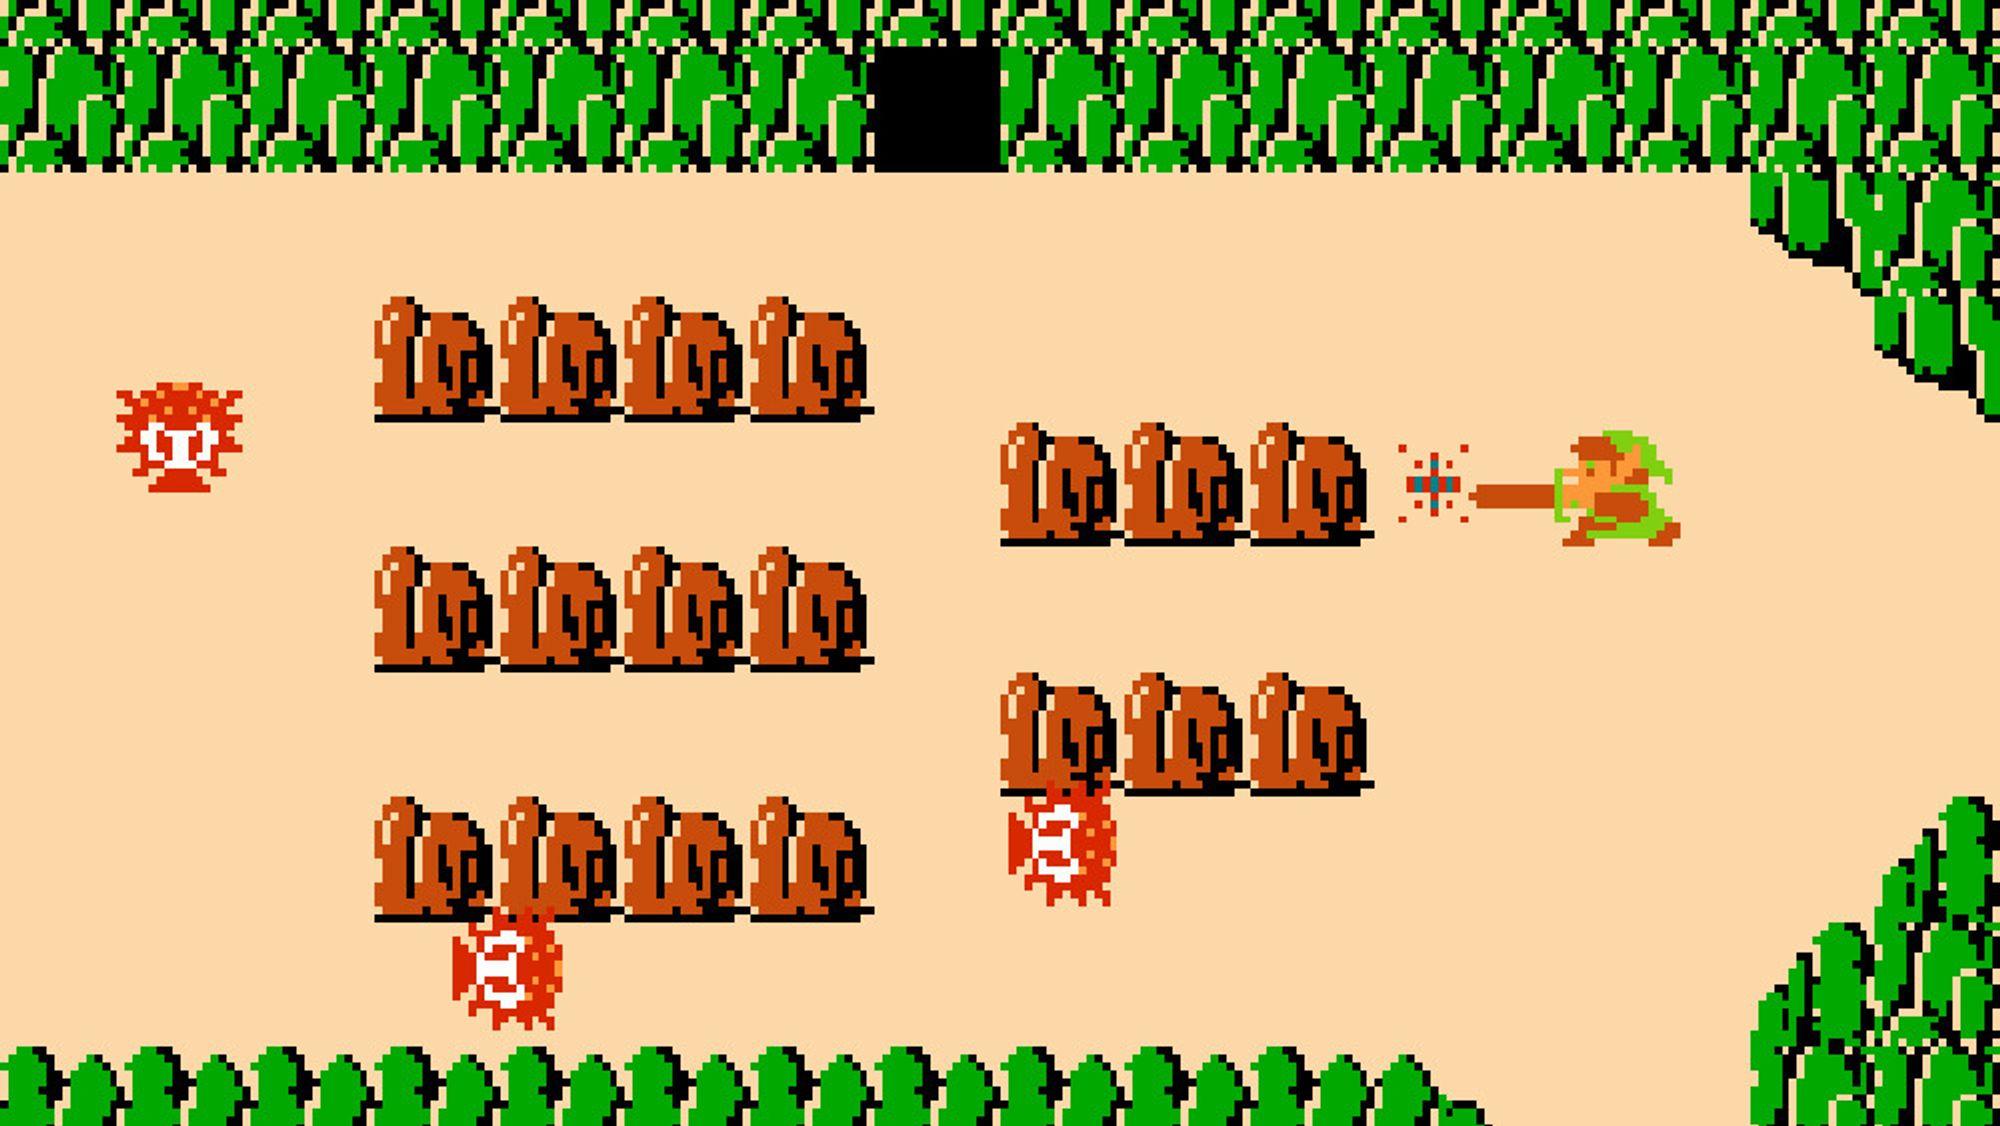 FEATURE: Husker du disse herlige spillmelodiene?